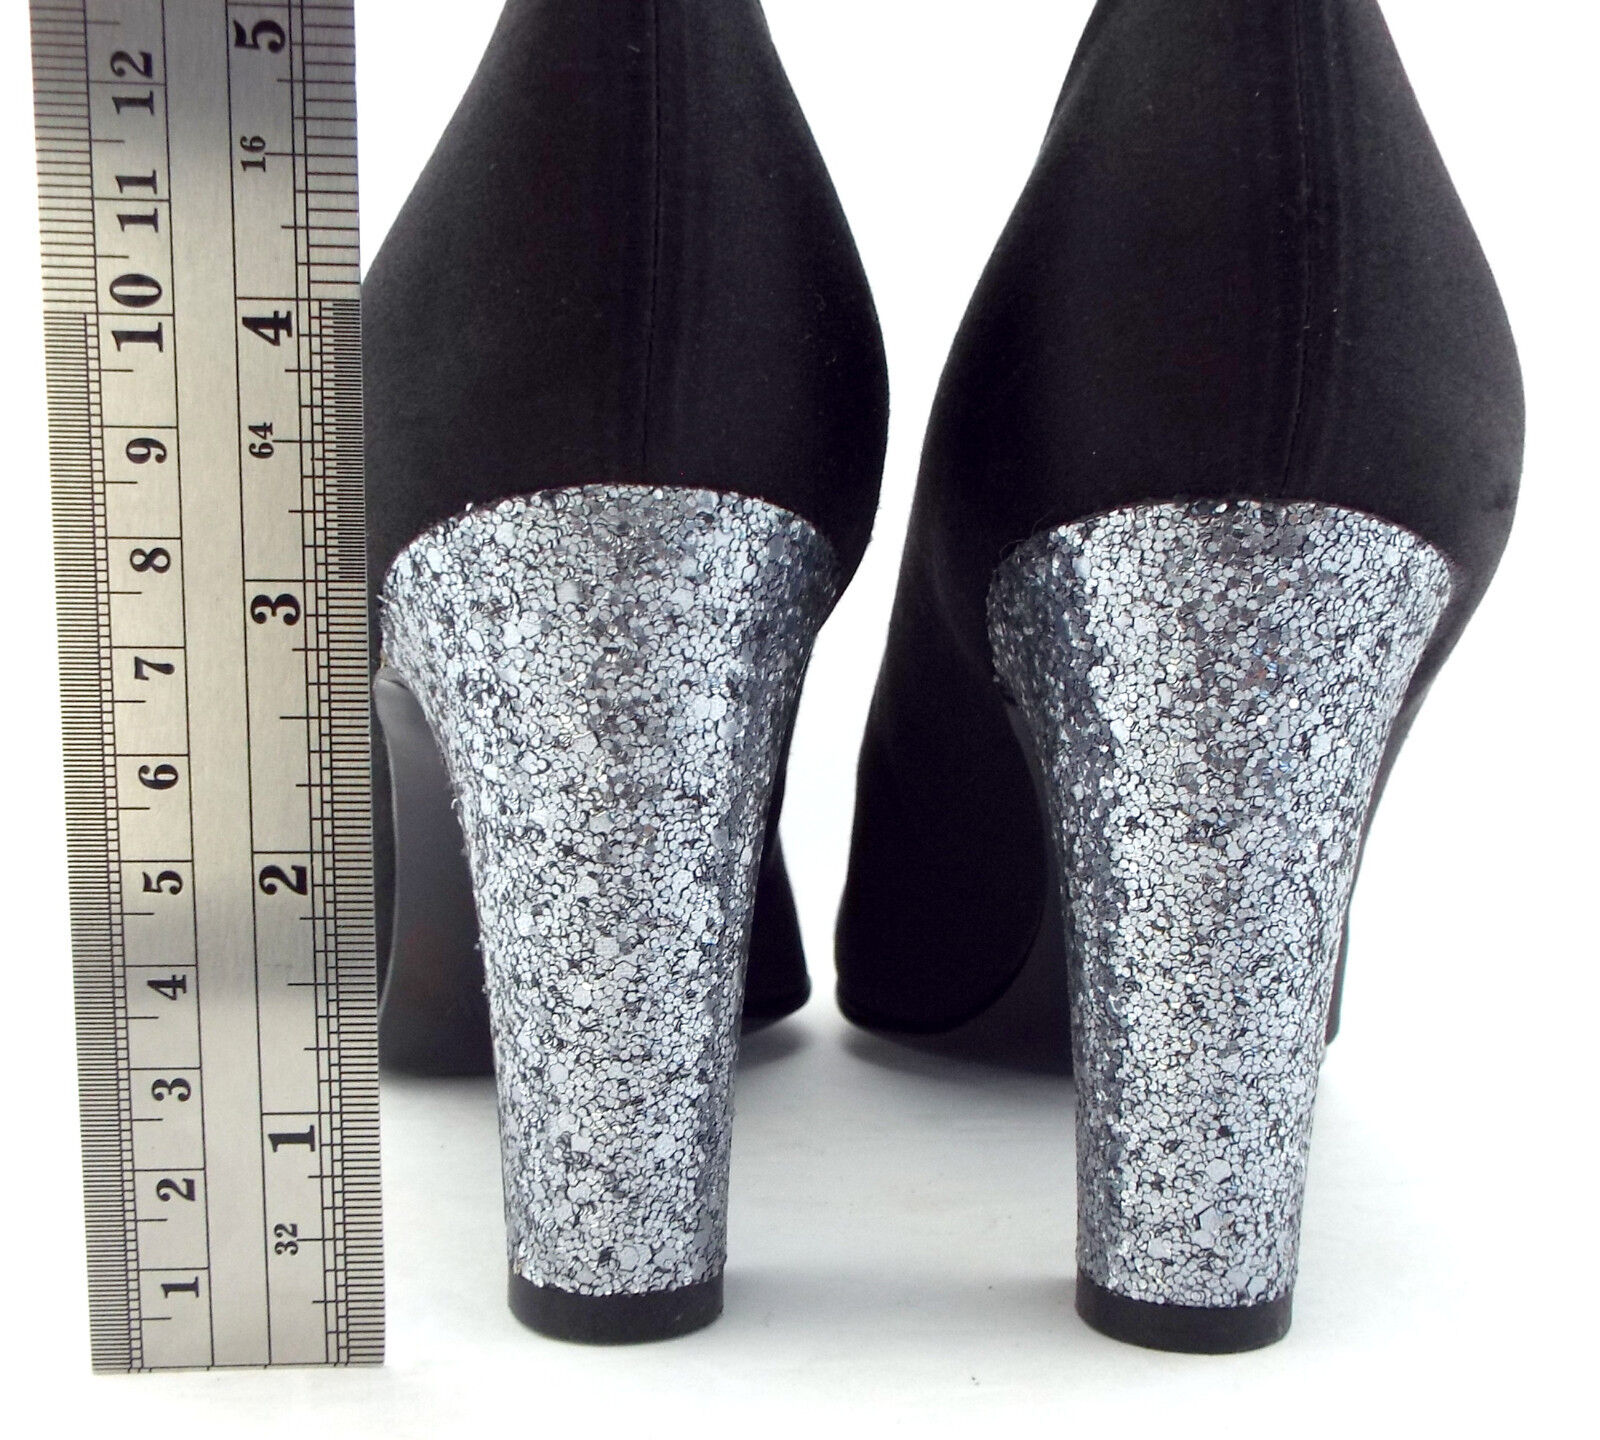 New J CREW Size 9 Black Satin Pumps Pumps Pumps w  Silver Glitter Heels shoes 681e2c